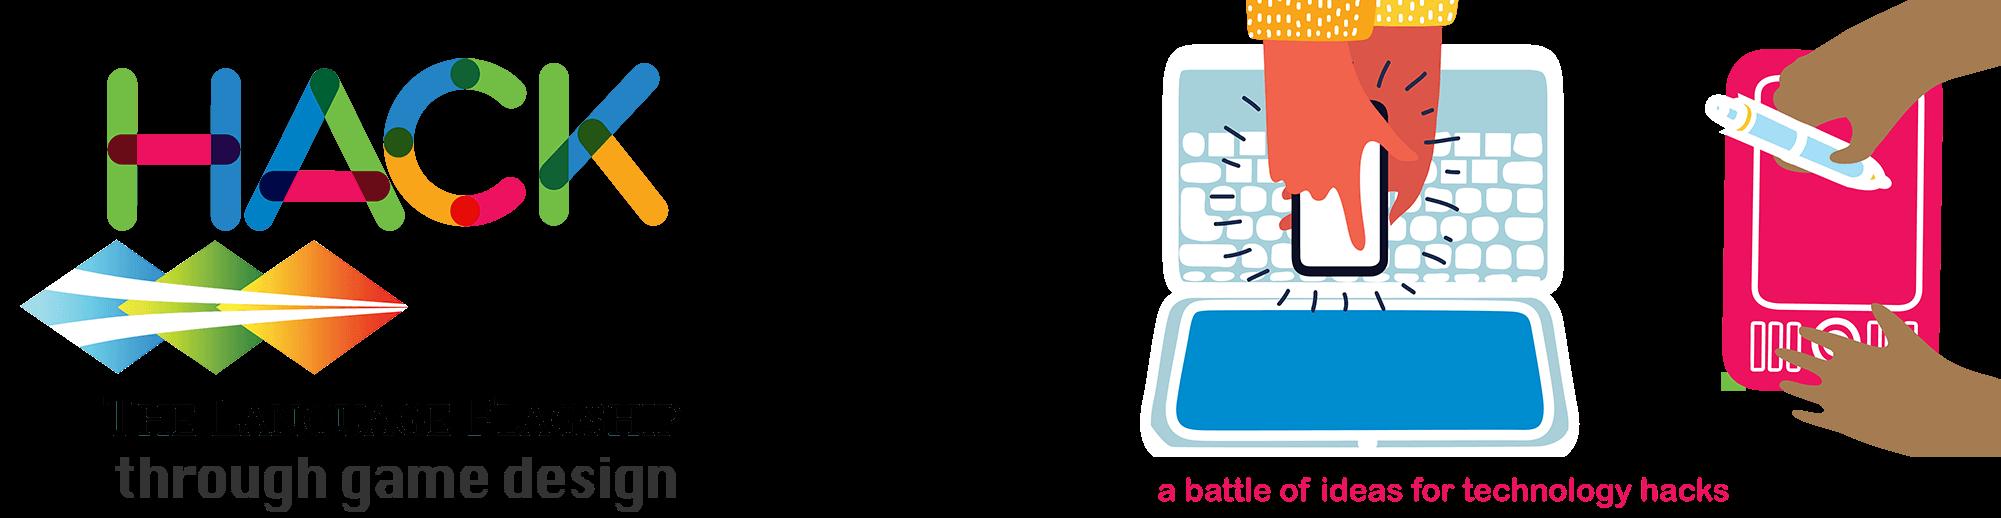 Hackathon 2021 banner